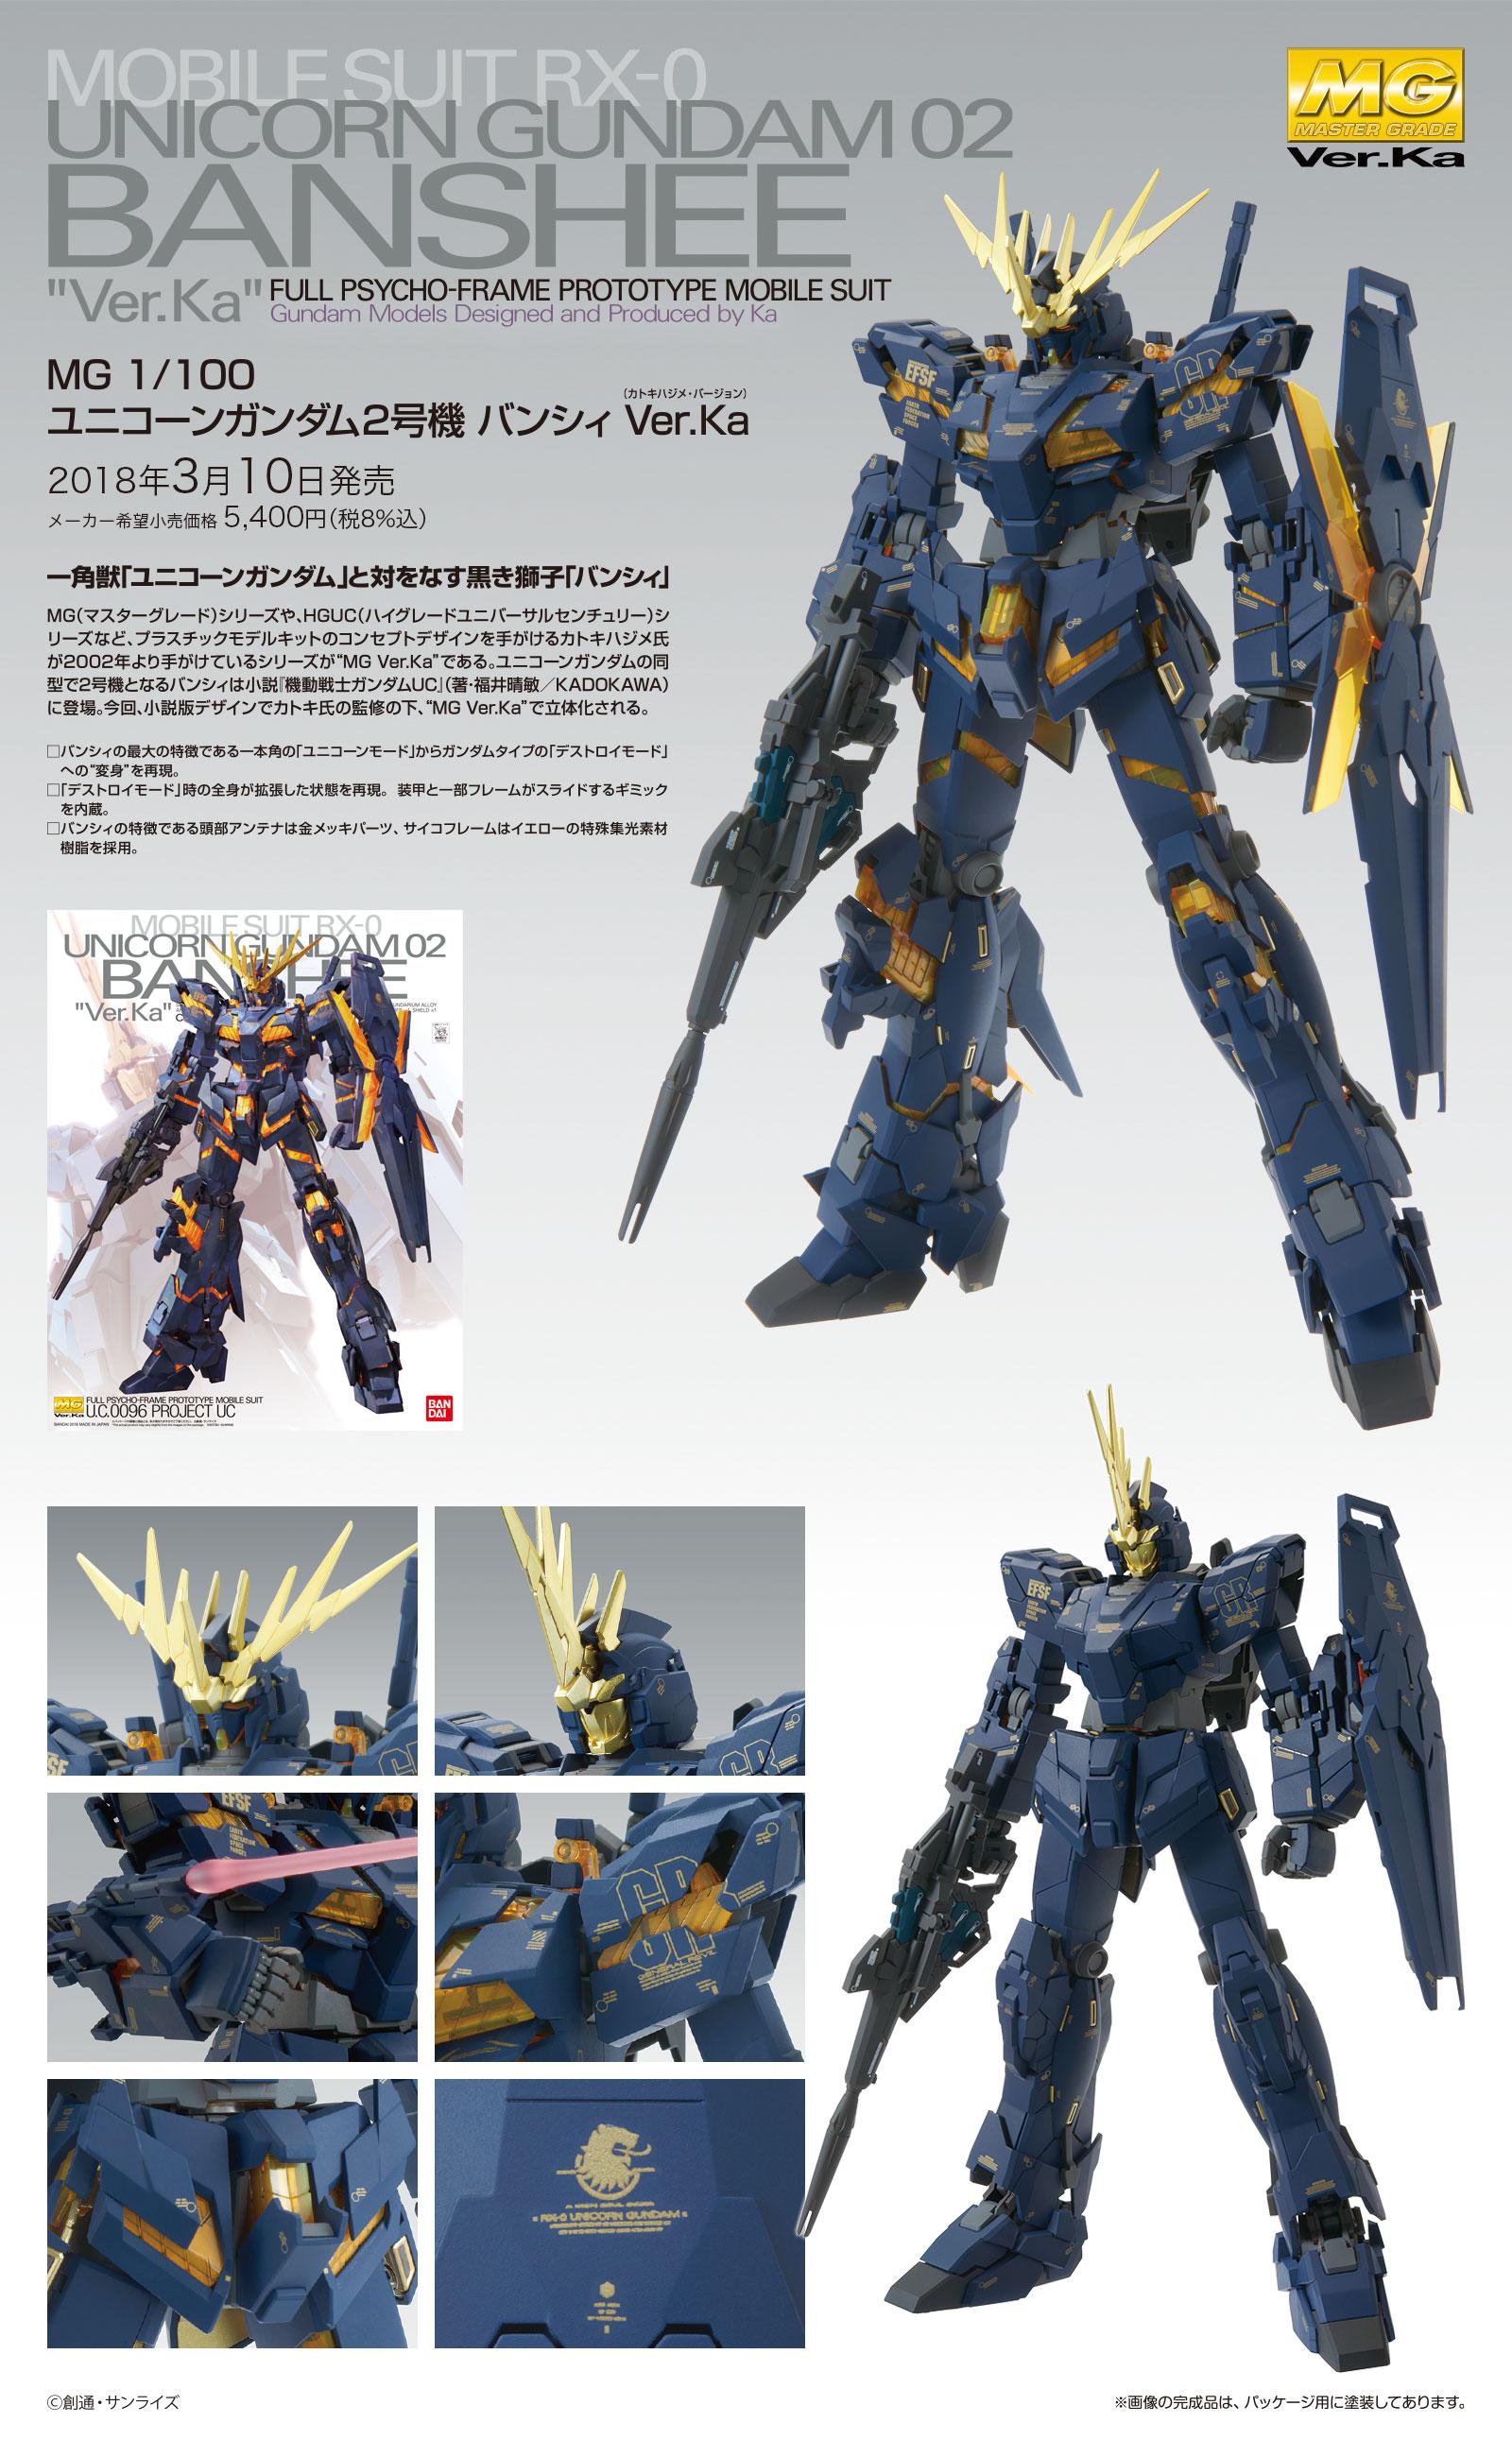 Ka GUNPLA MG Master Grade 1//100 BANDAI RX-0 Gundam Unicorn 02 Banshee Ver